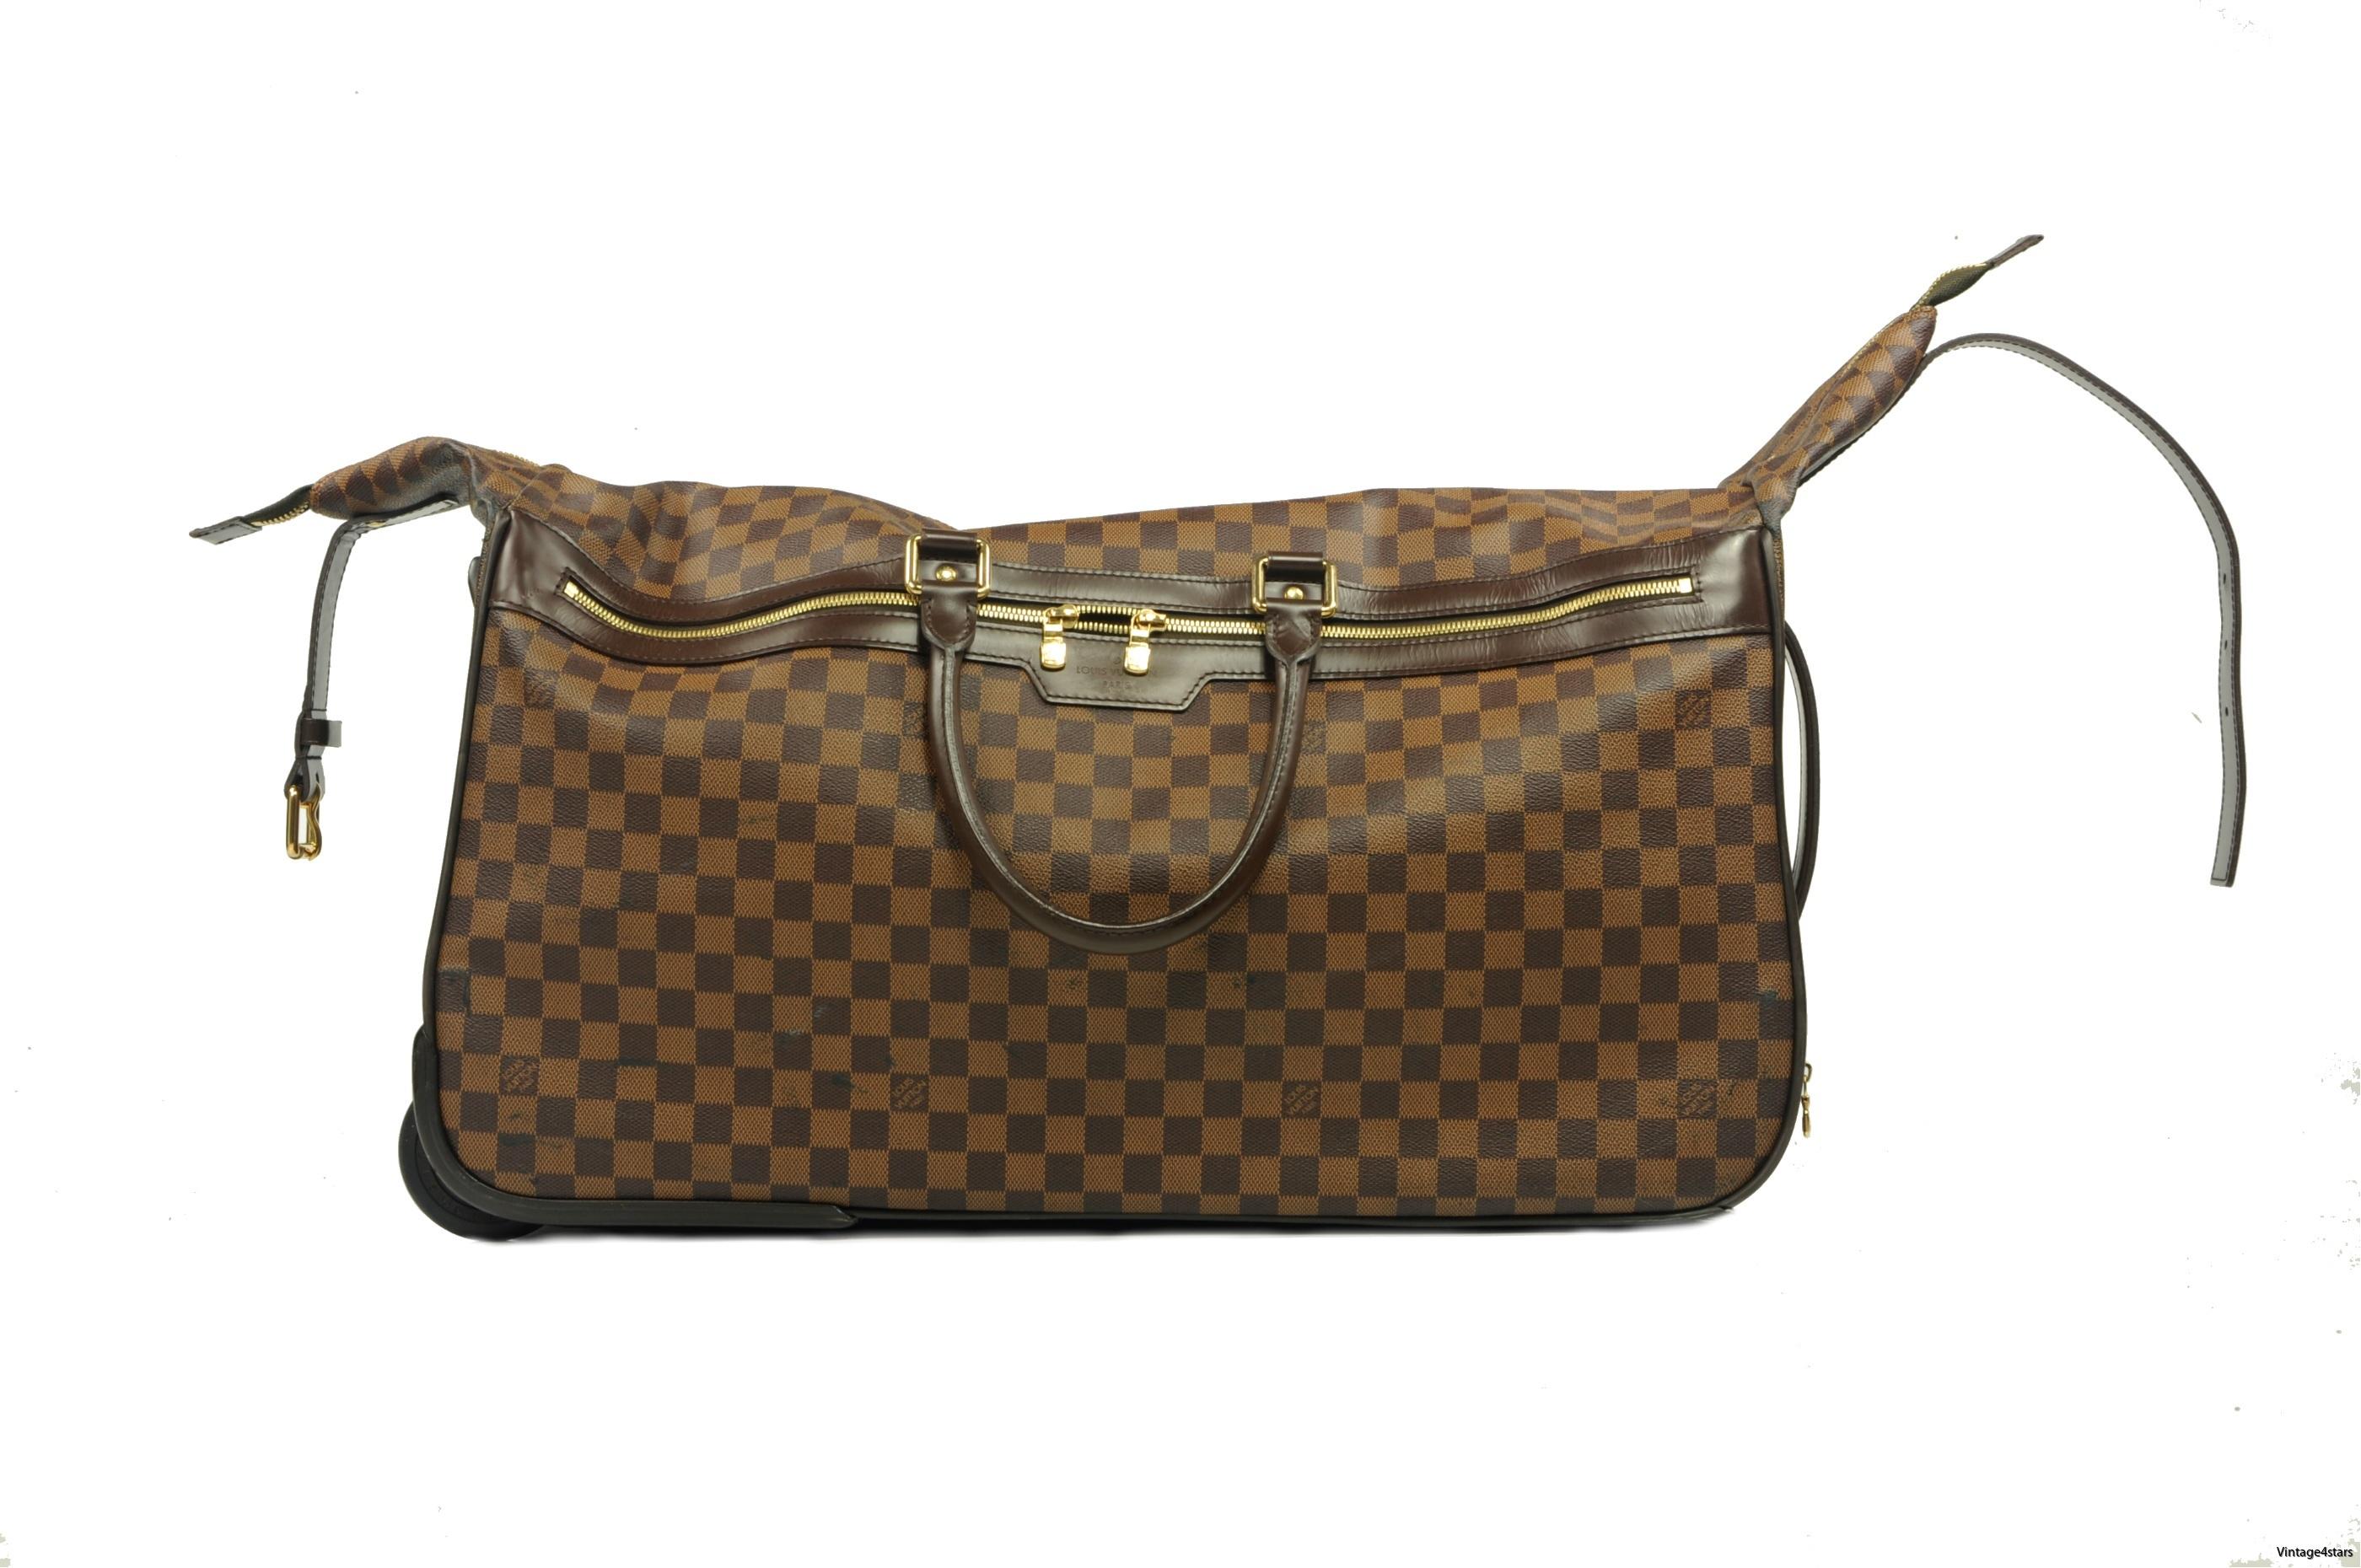 Louis Vuitton Eole 60 Damier Ebene 2